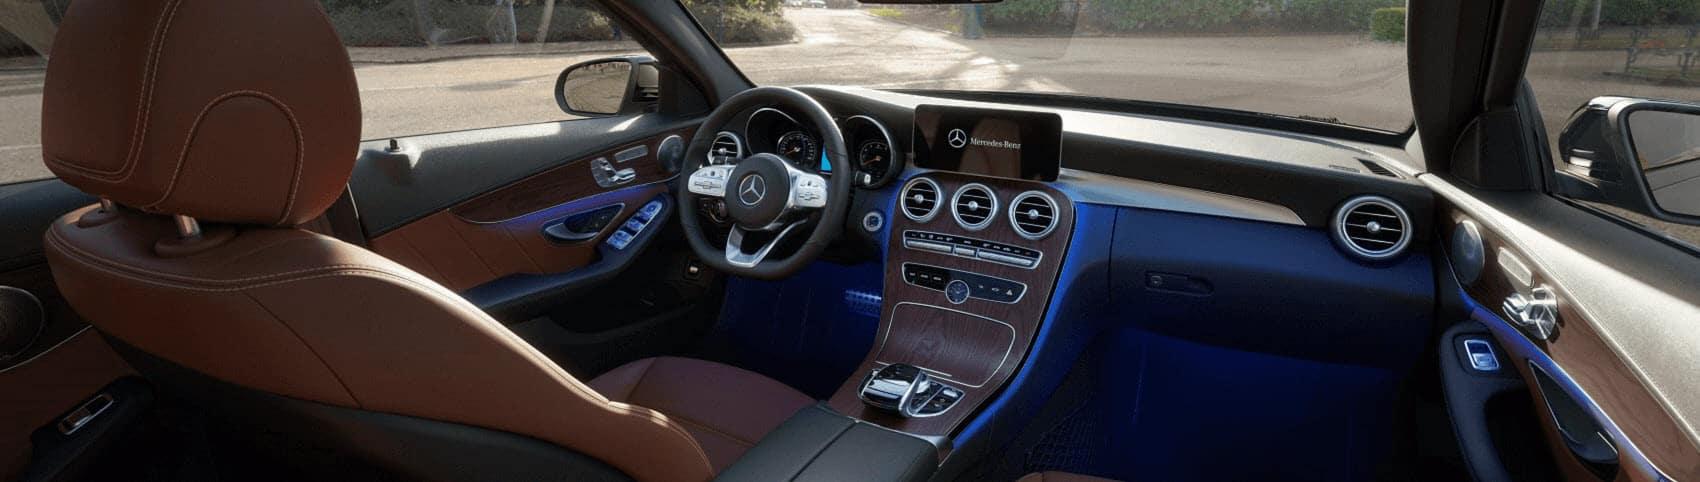 Mercedes C-Class Interior Dashboard